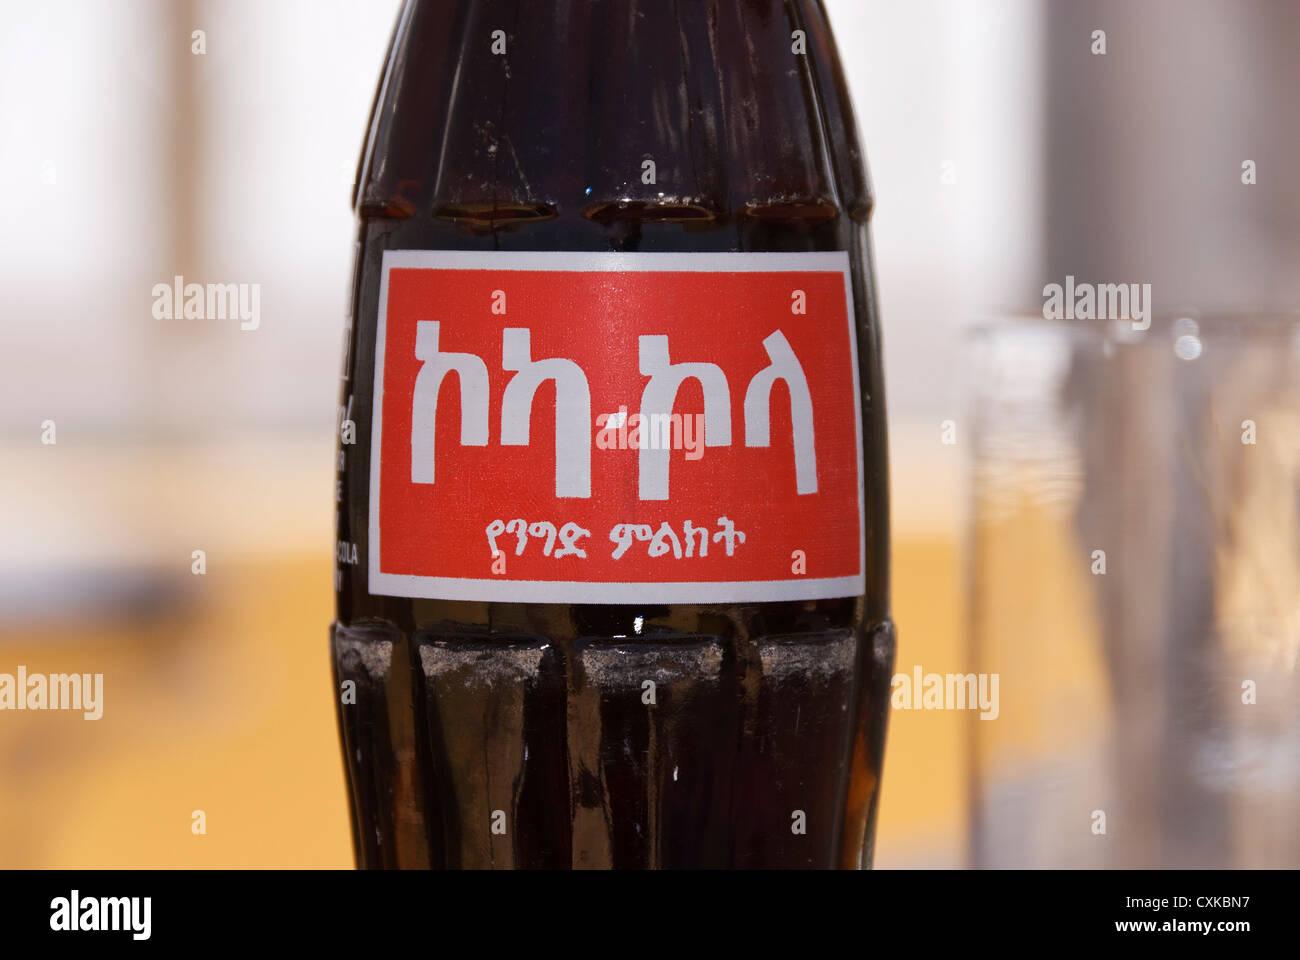 Elk200-1176 Ethiopia, Addis Ababa, Coca Cola bottle with Amharic script - Stock Image